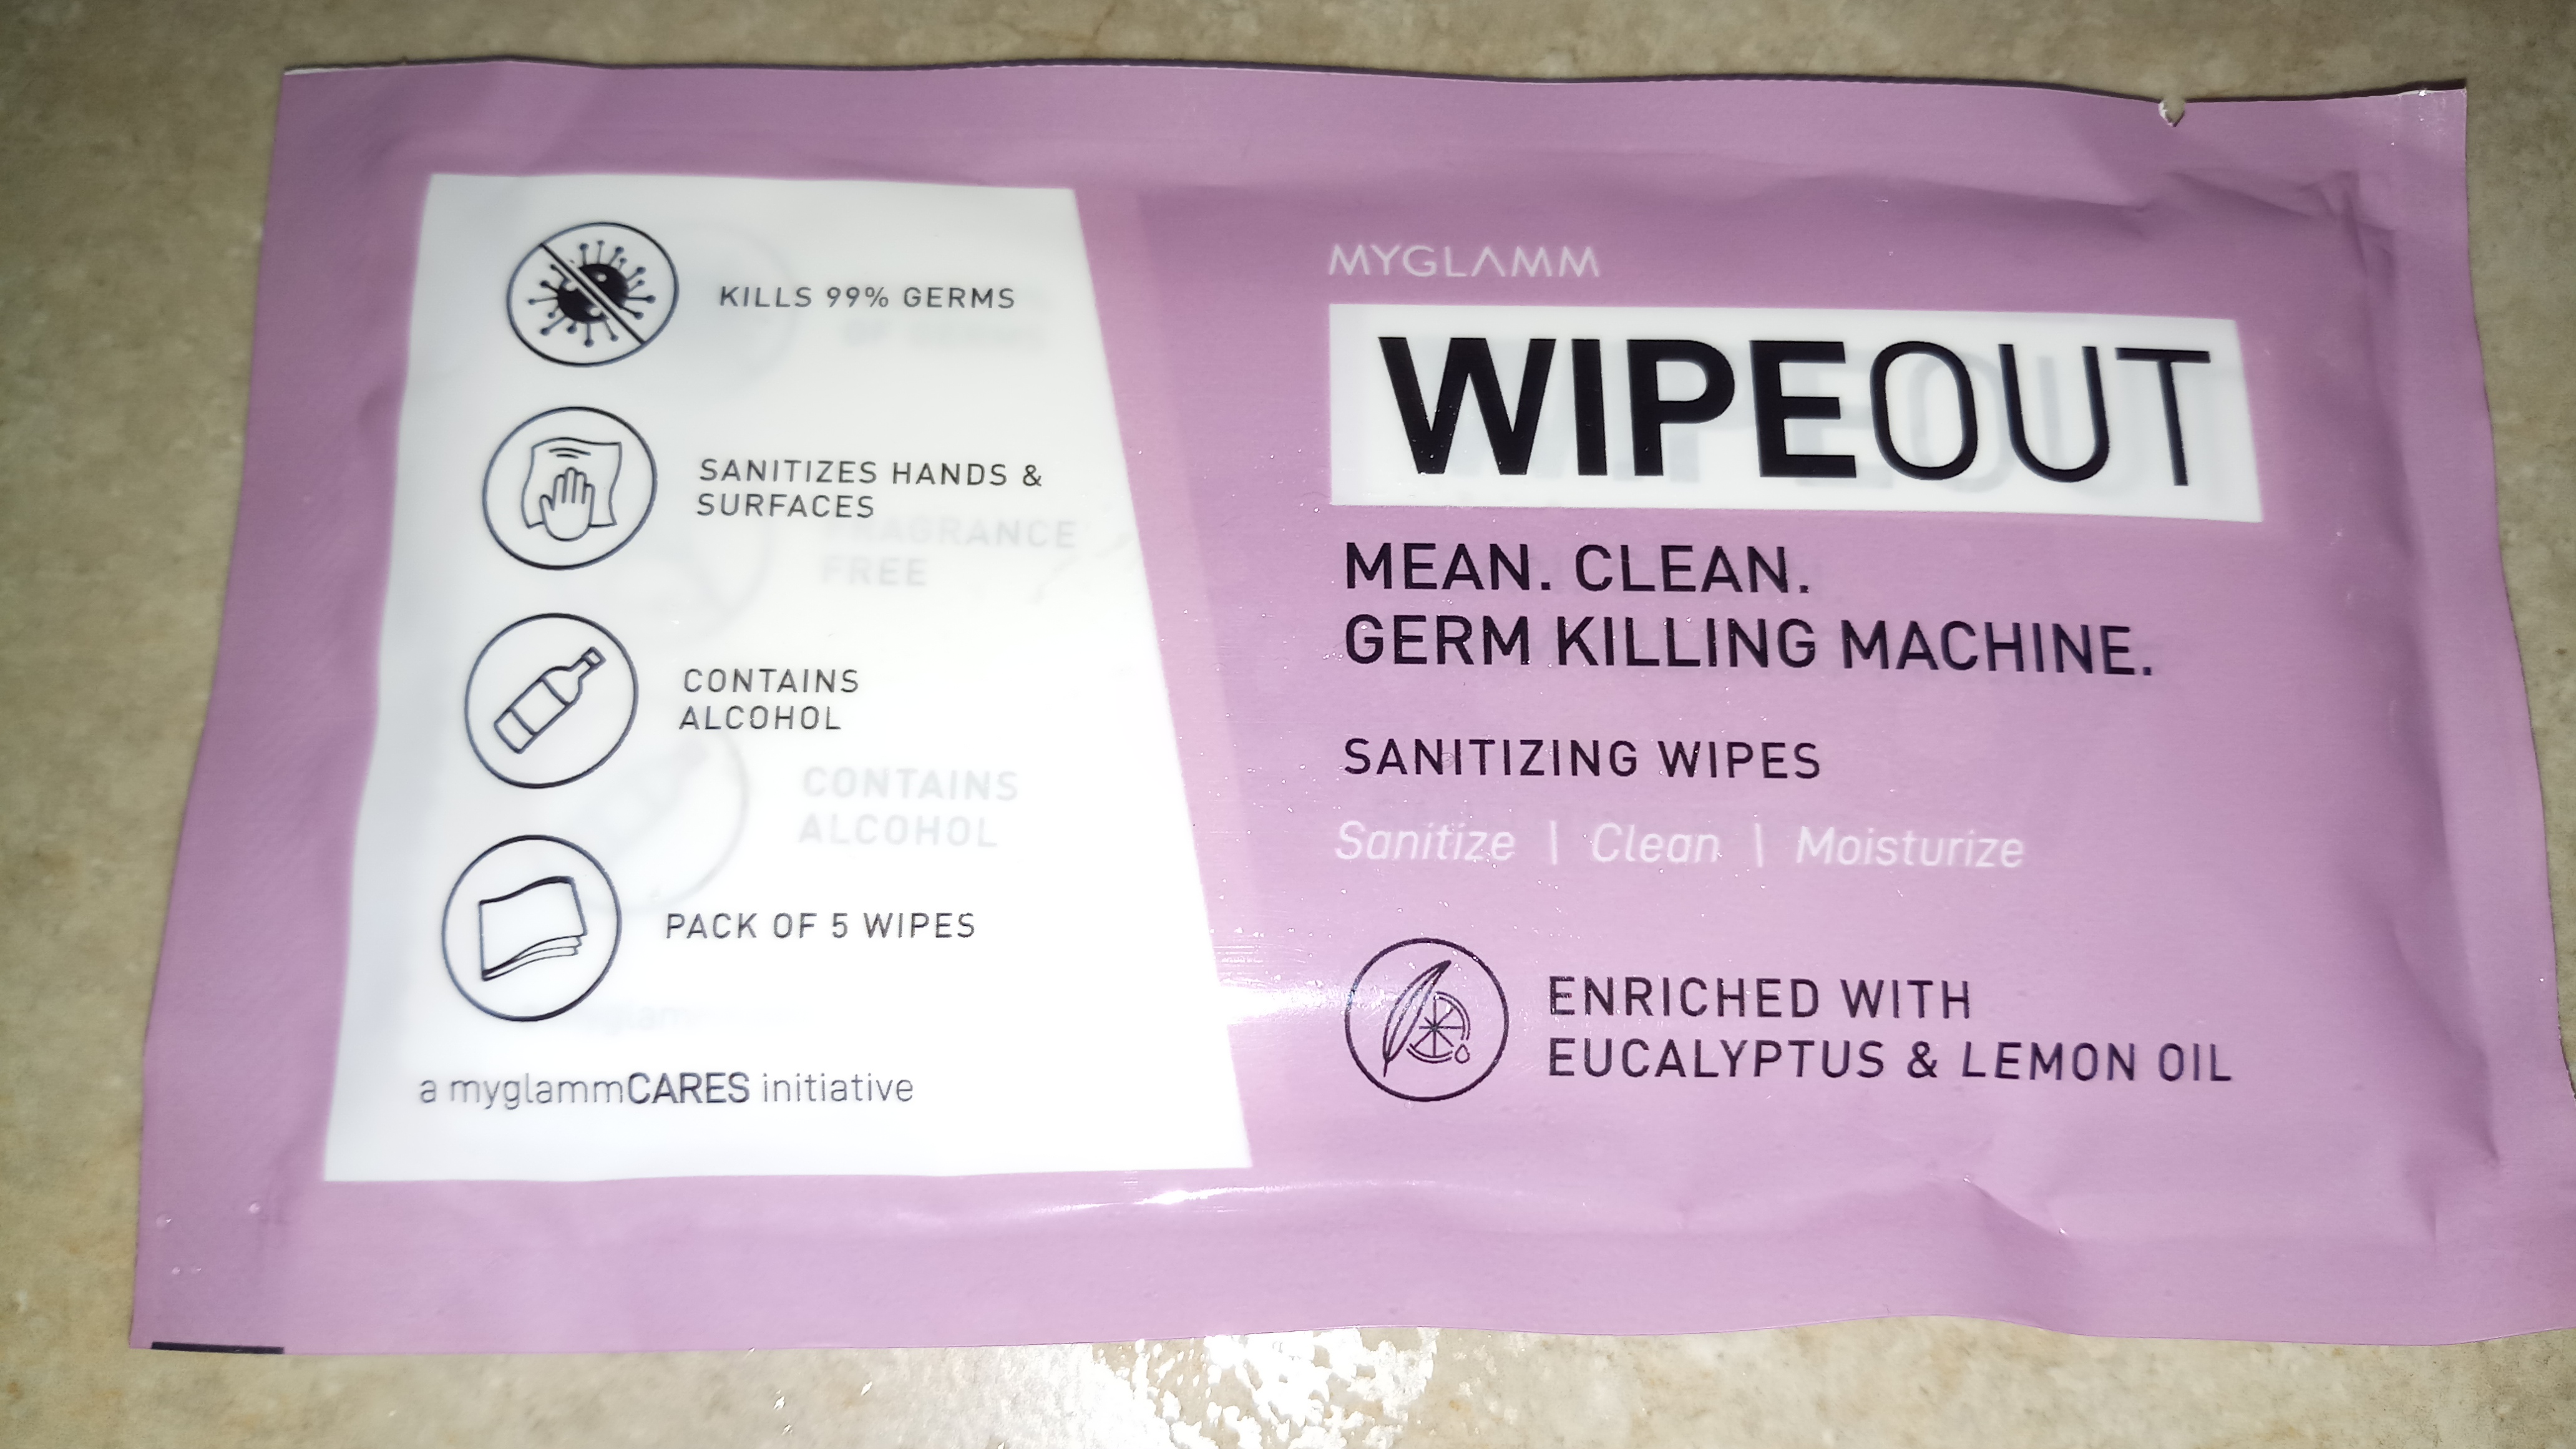 MyGlamm Wipeout Sanitizing Wipes-Amazing product!-By tina240995